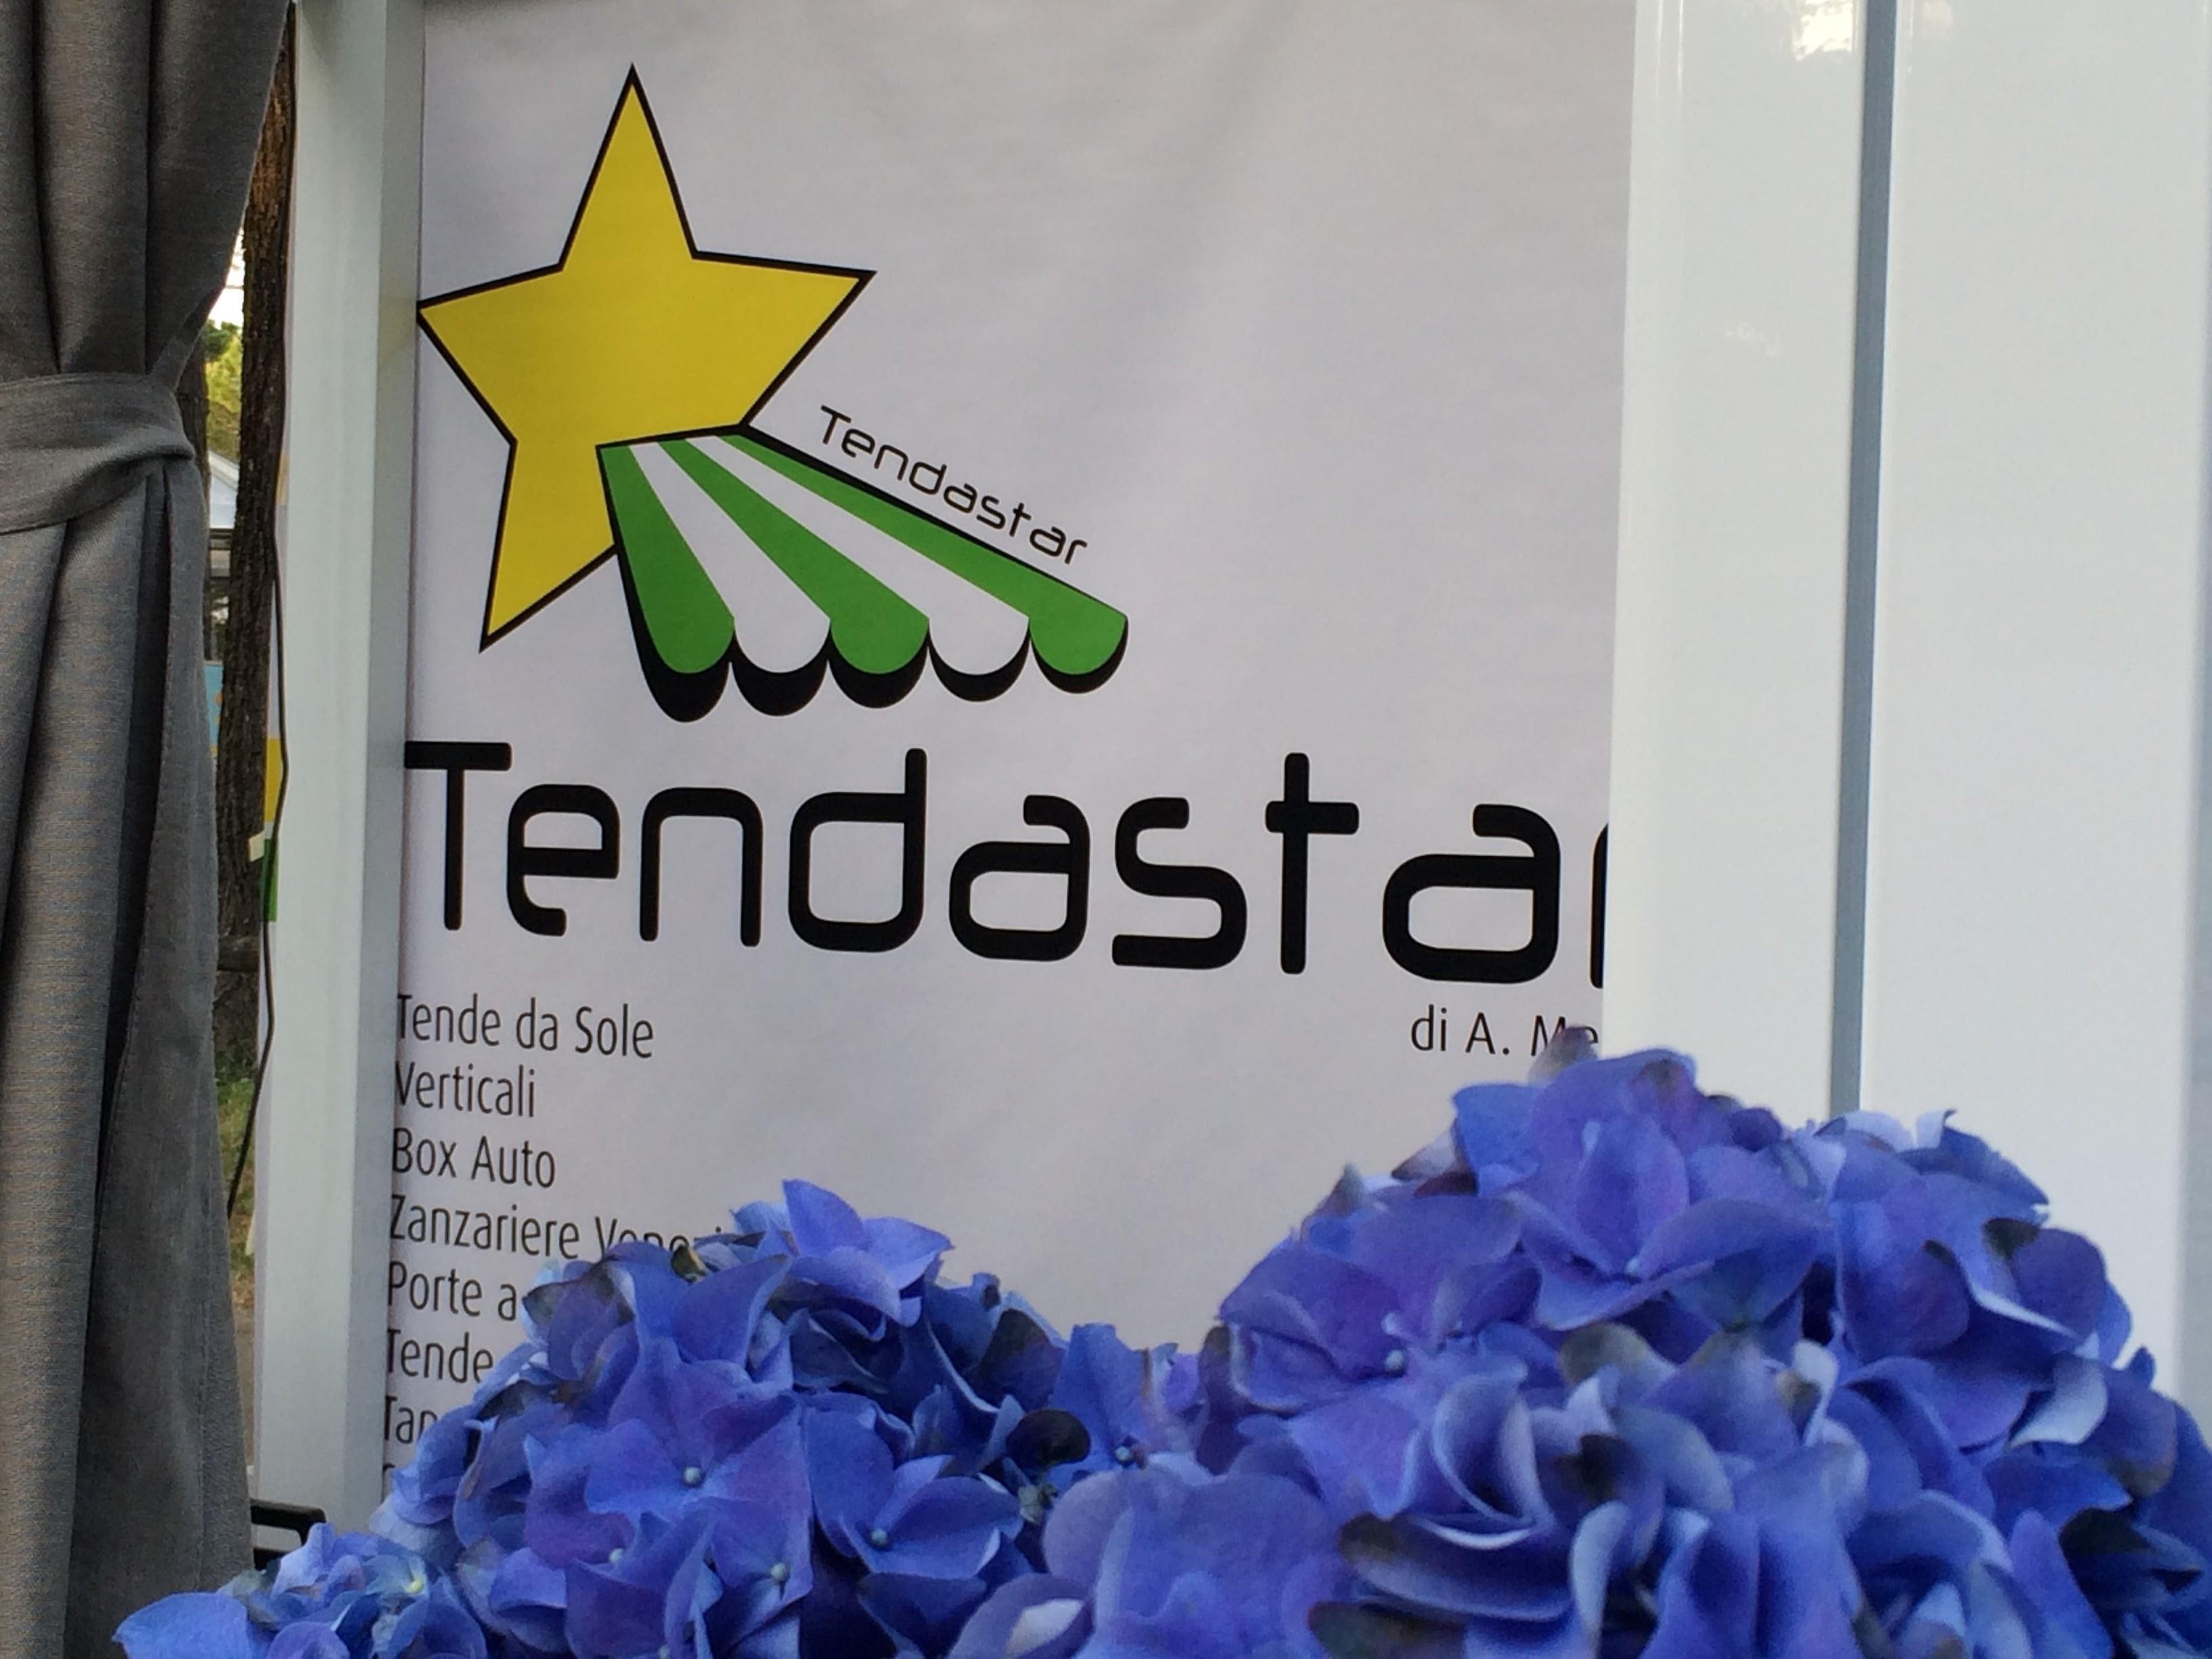 Tende Per Interni Udine i migliori 29 installatori di tende per interni a udine